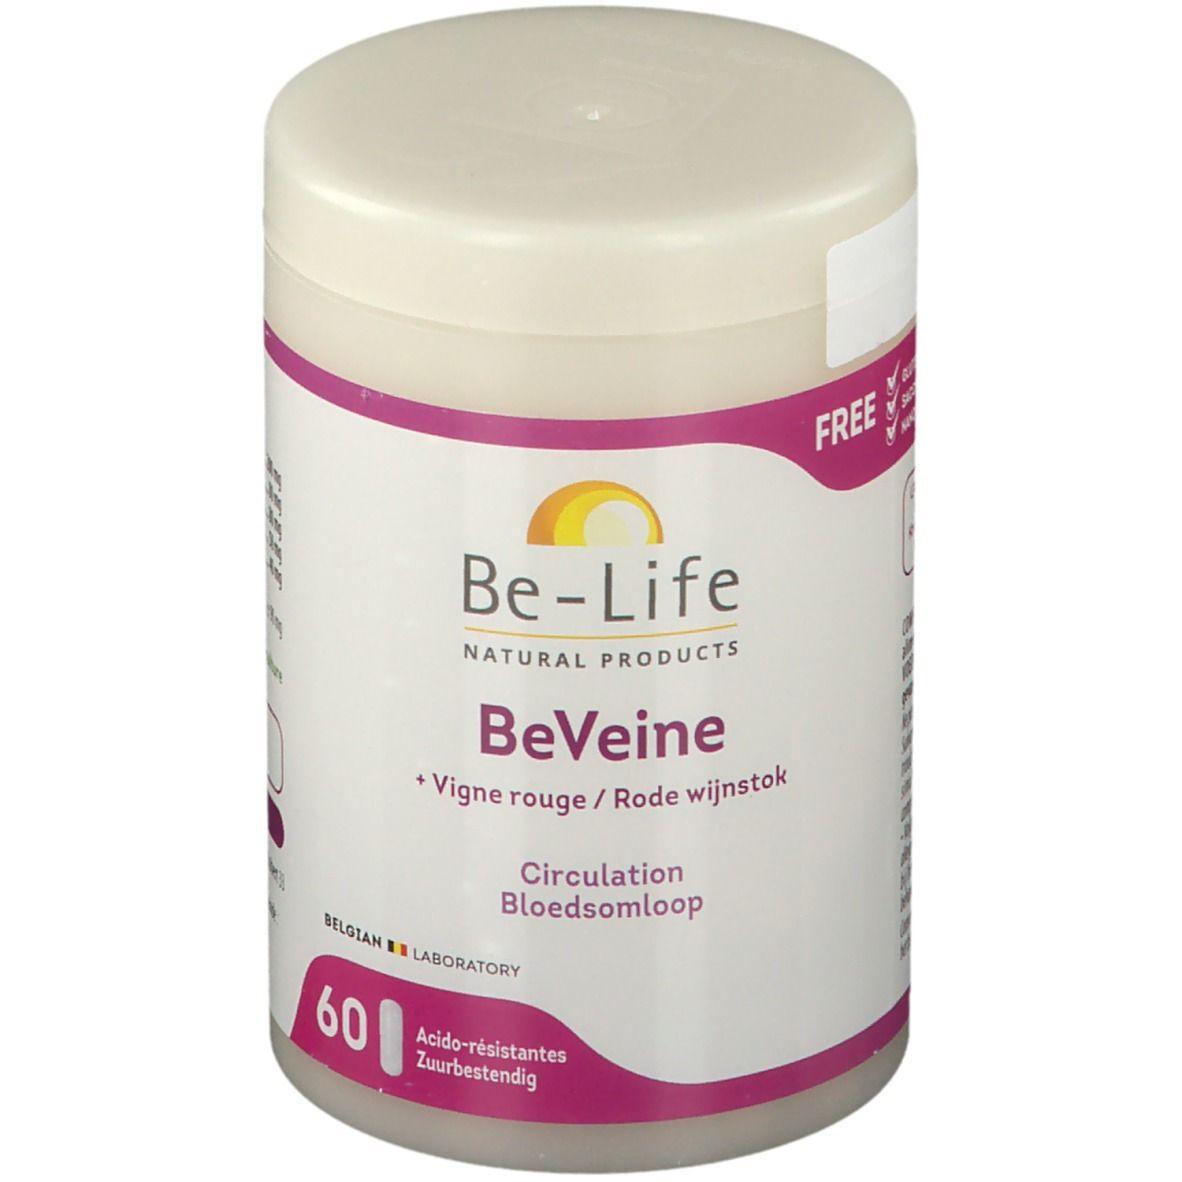 Image of Be-Life BeVeine +Rote Weinstock